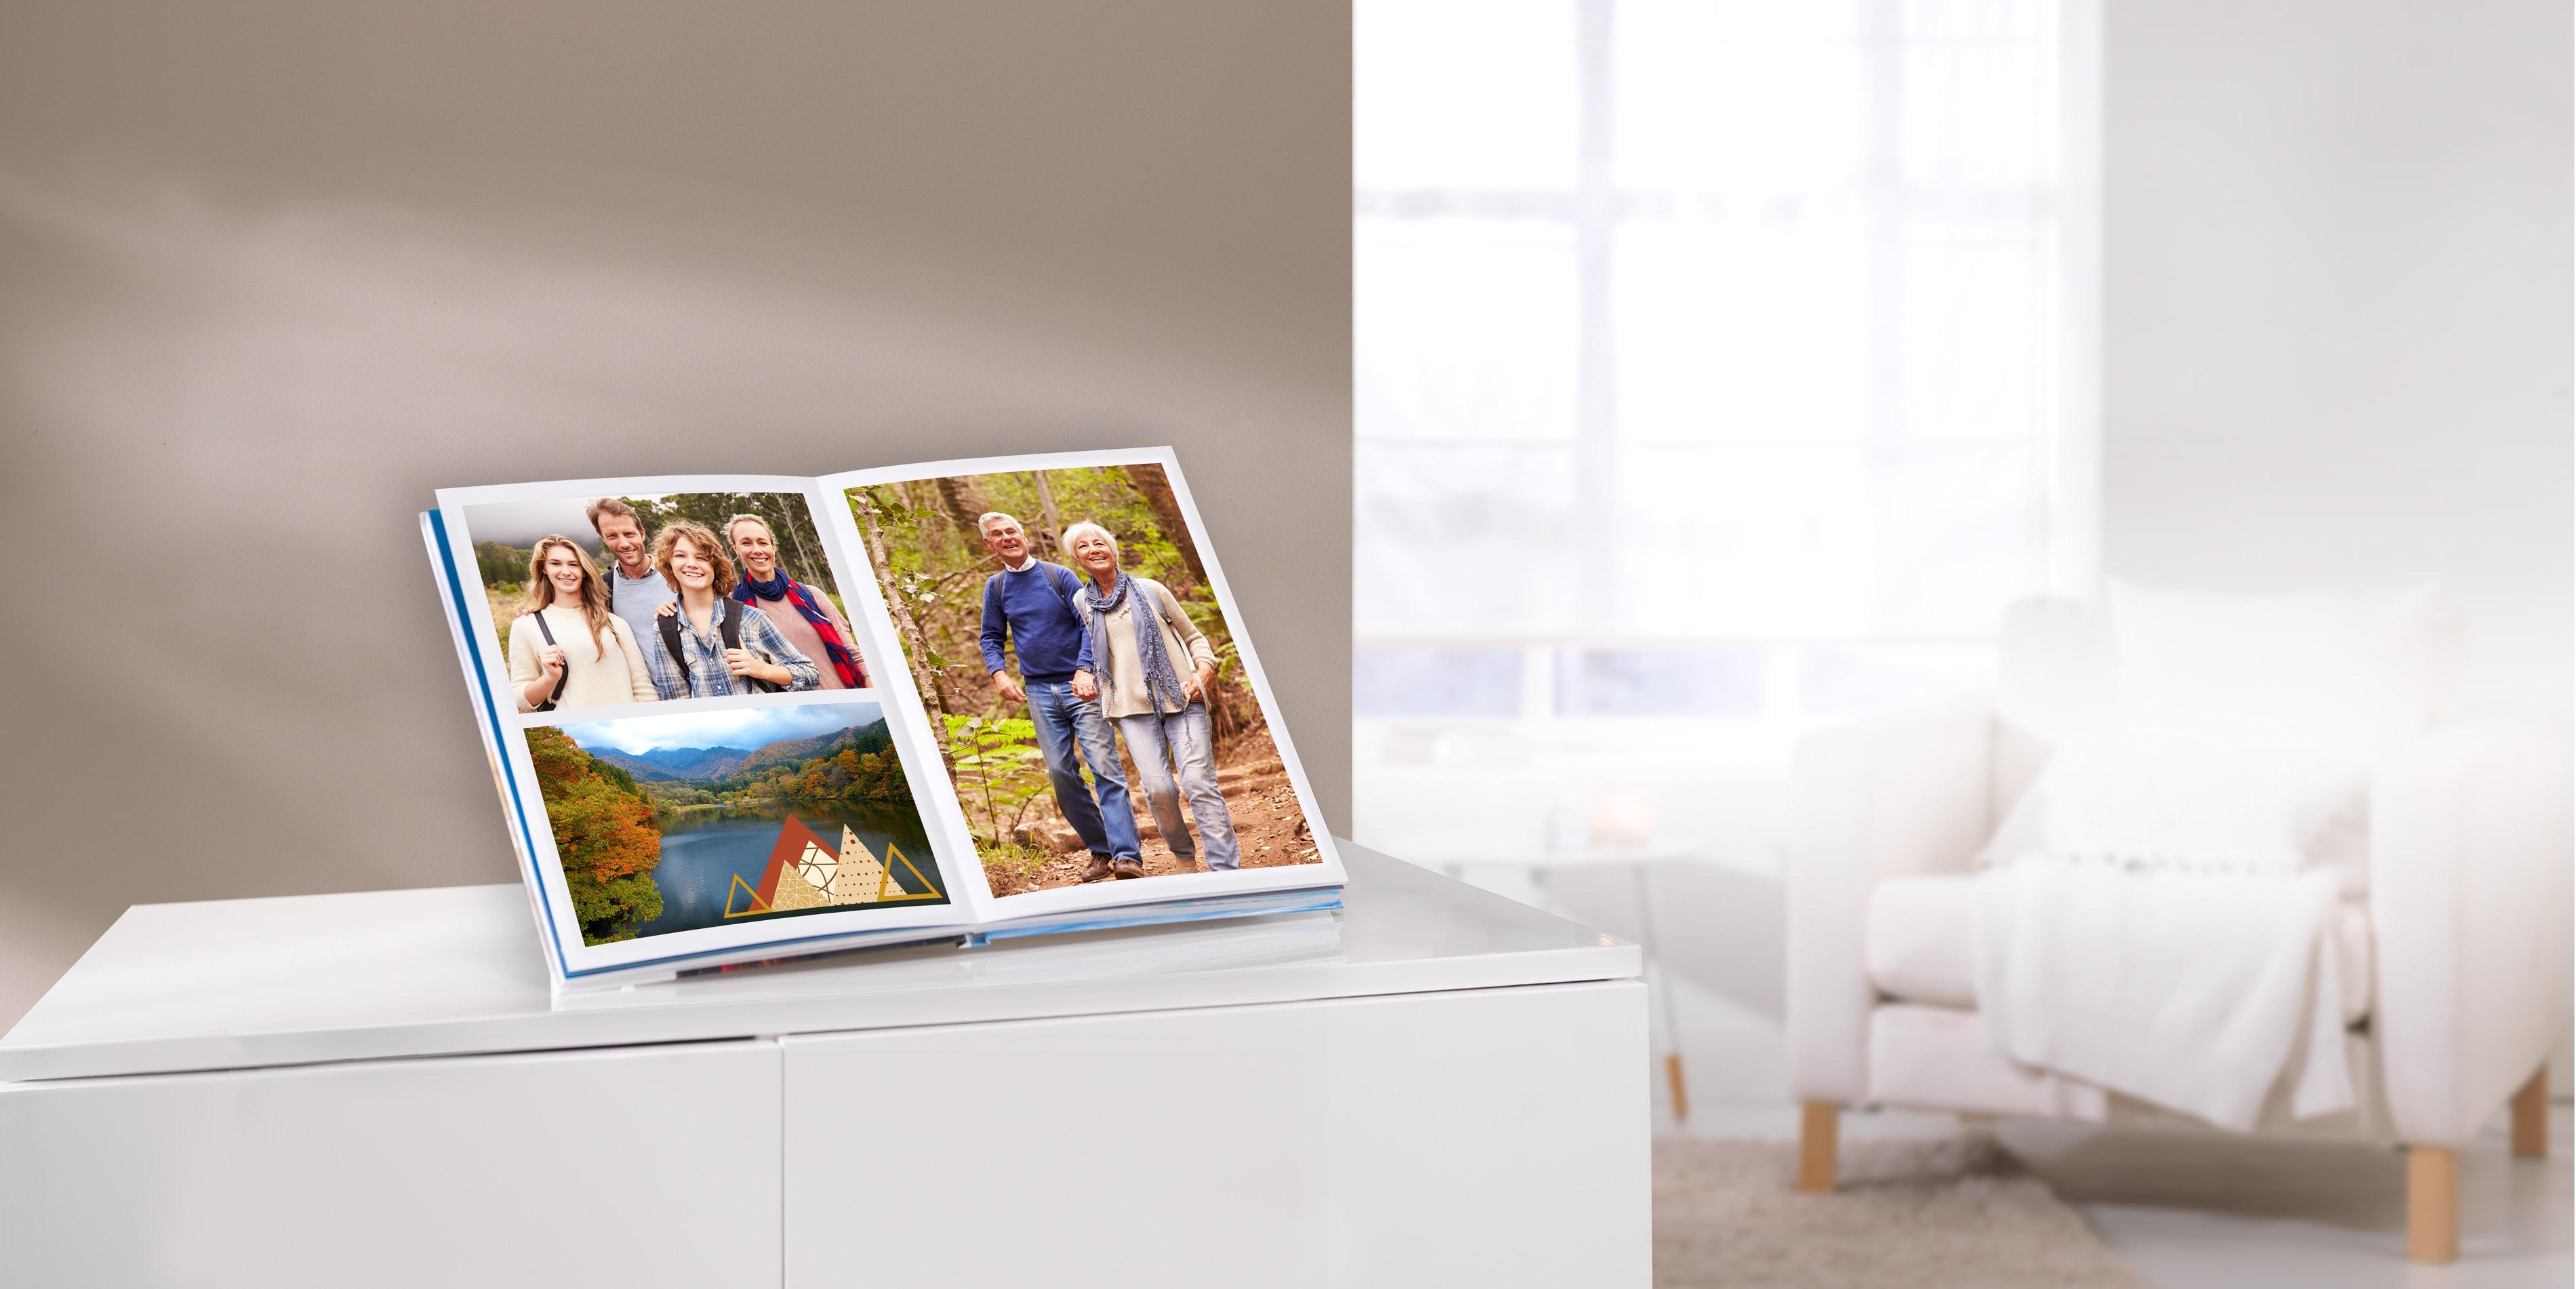 pixum fotobücher online erstellen pixum  super einfach super schnell fotobucher online erstellen #4